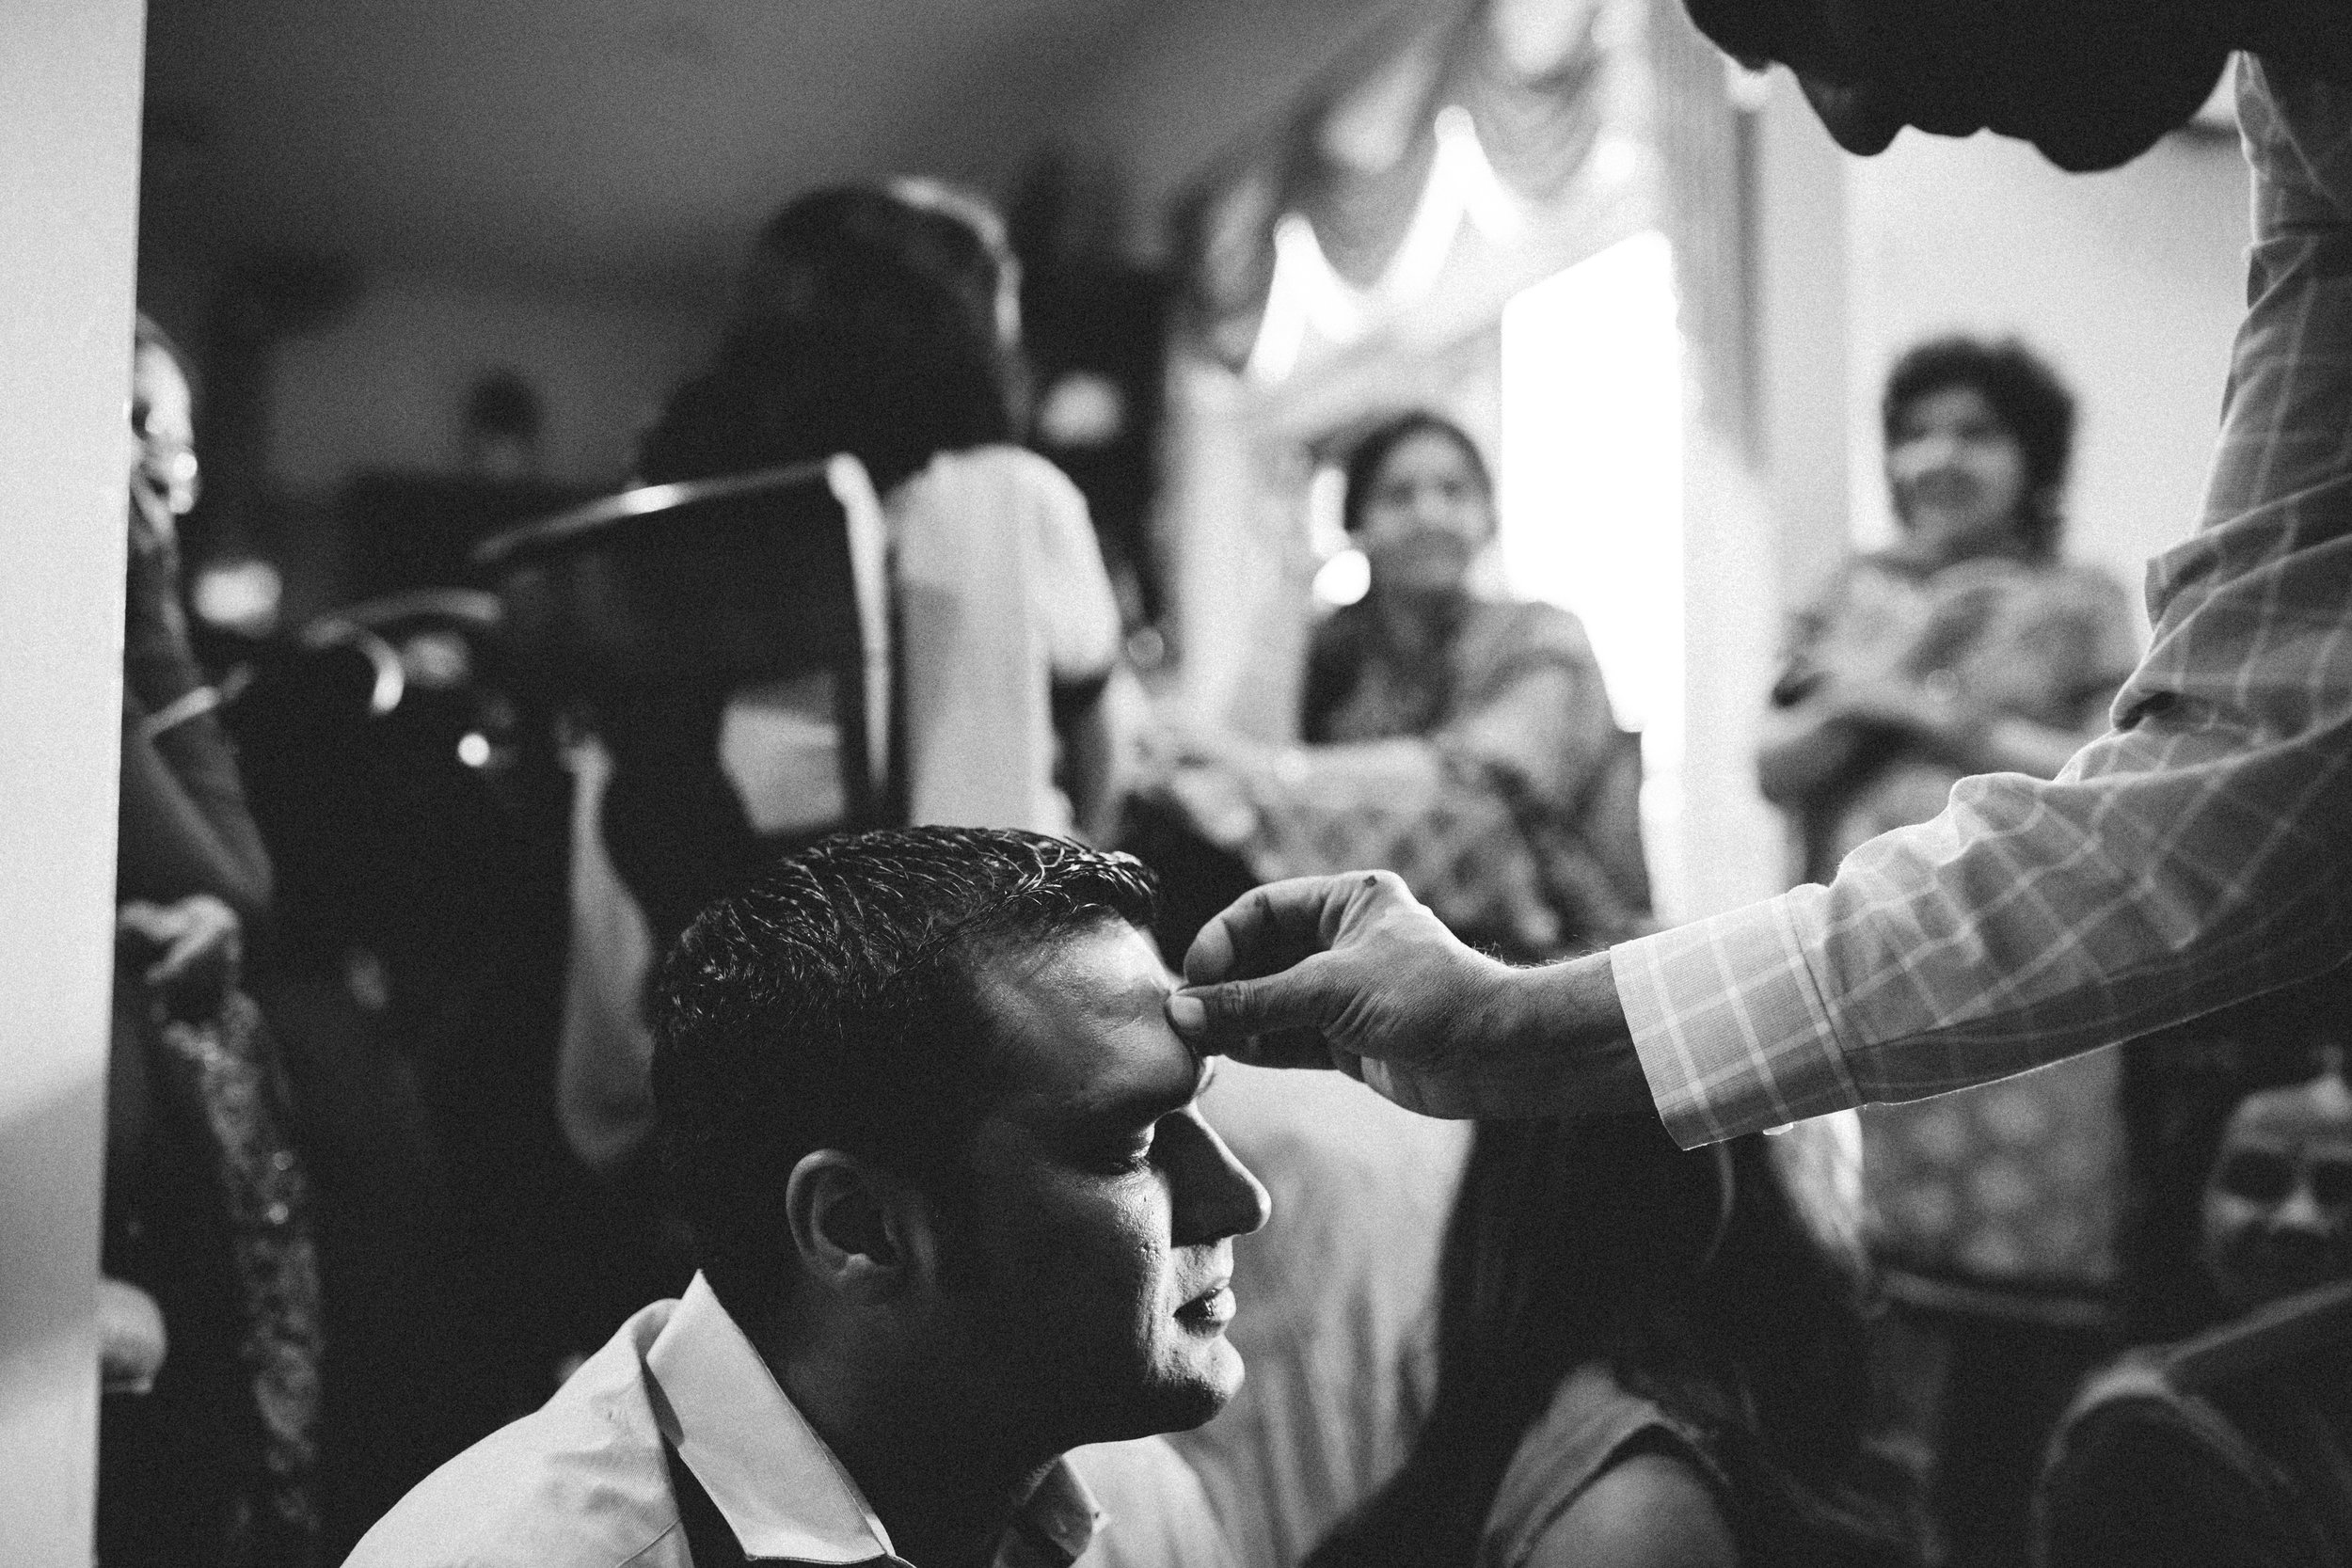 Aparna-Ankit-Patel-Mehndi-Wedding-Photos-0055.jpg